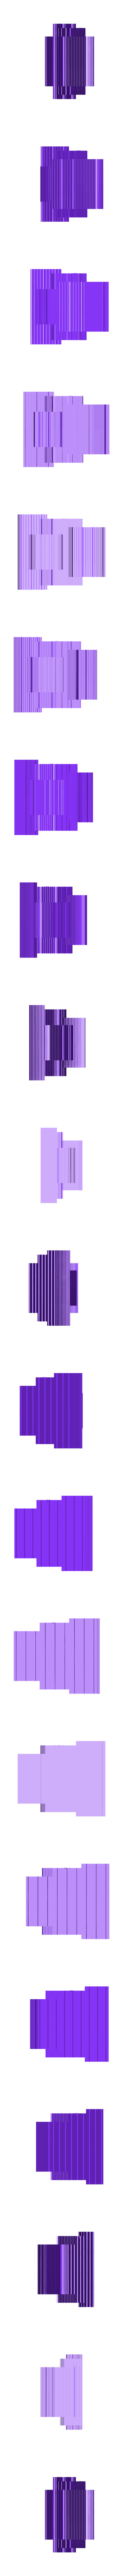 Color1_WindowStruts.stl Download free STL file Nordic-Inspired Multi-color Architectural Model • 3D printer model, MosaicManufacturing